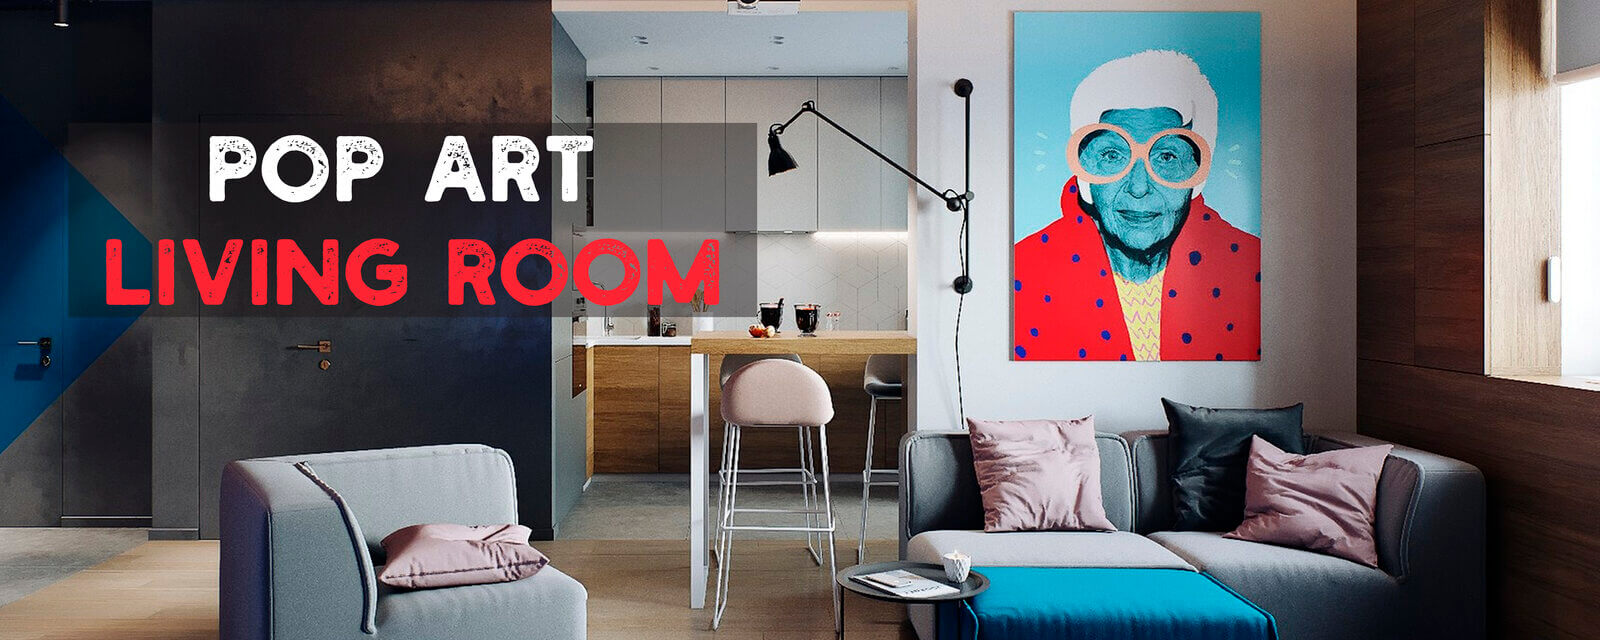 Pop Art | Living Room